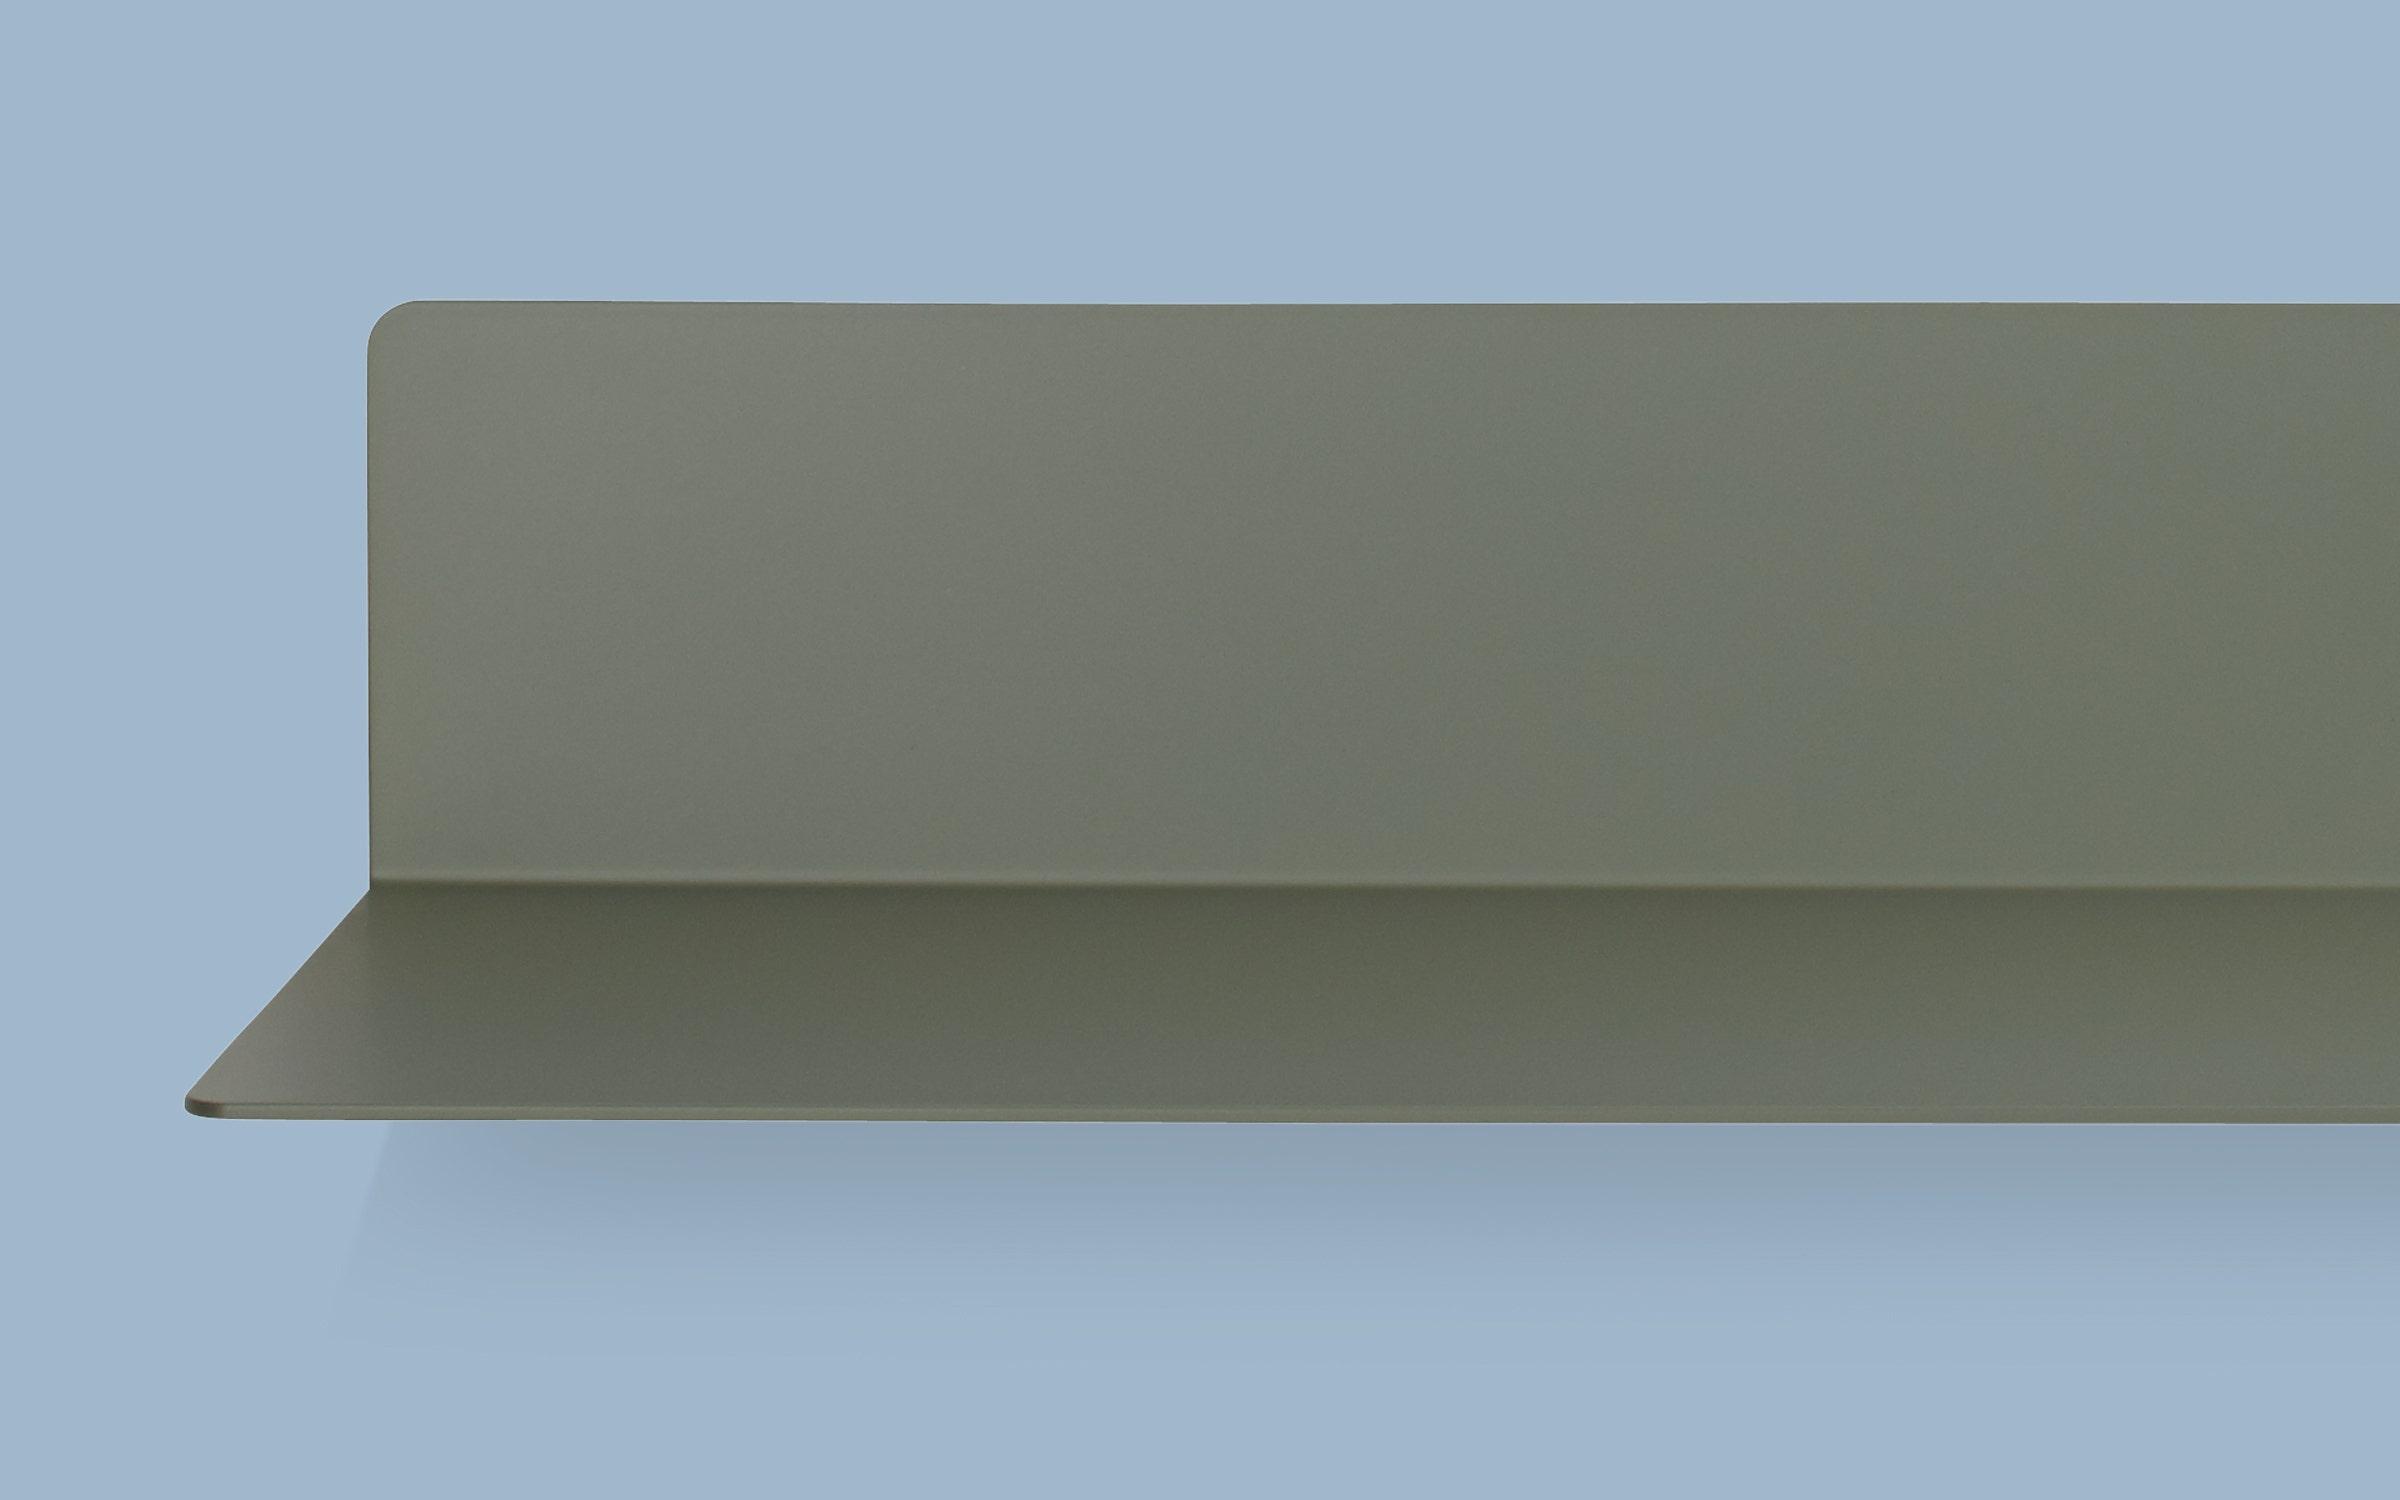 Welf Large Wall Shelf